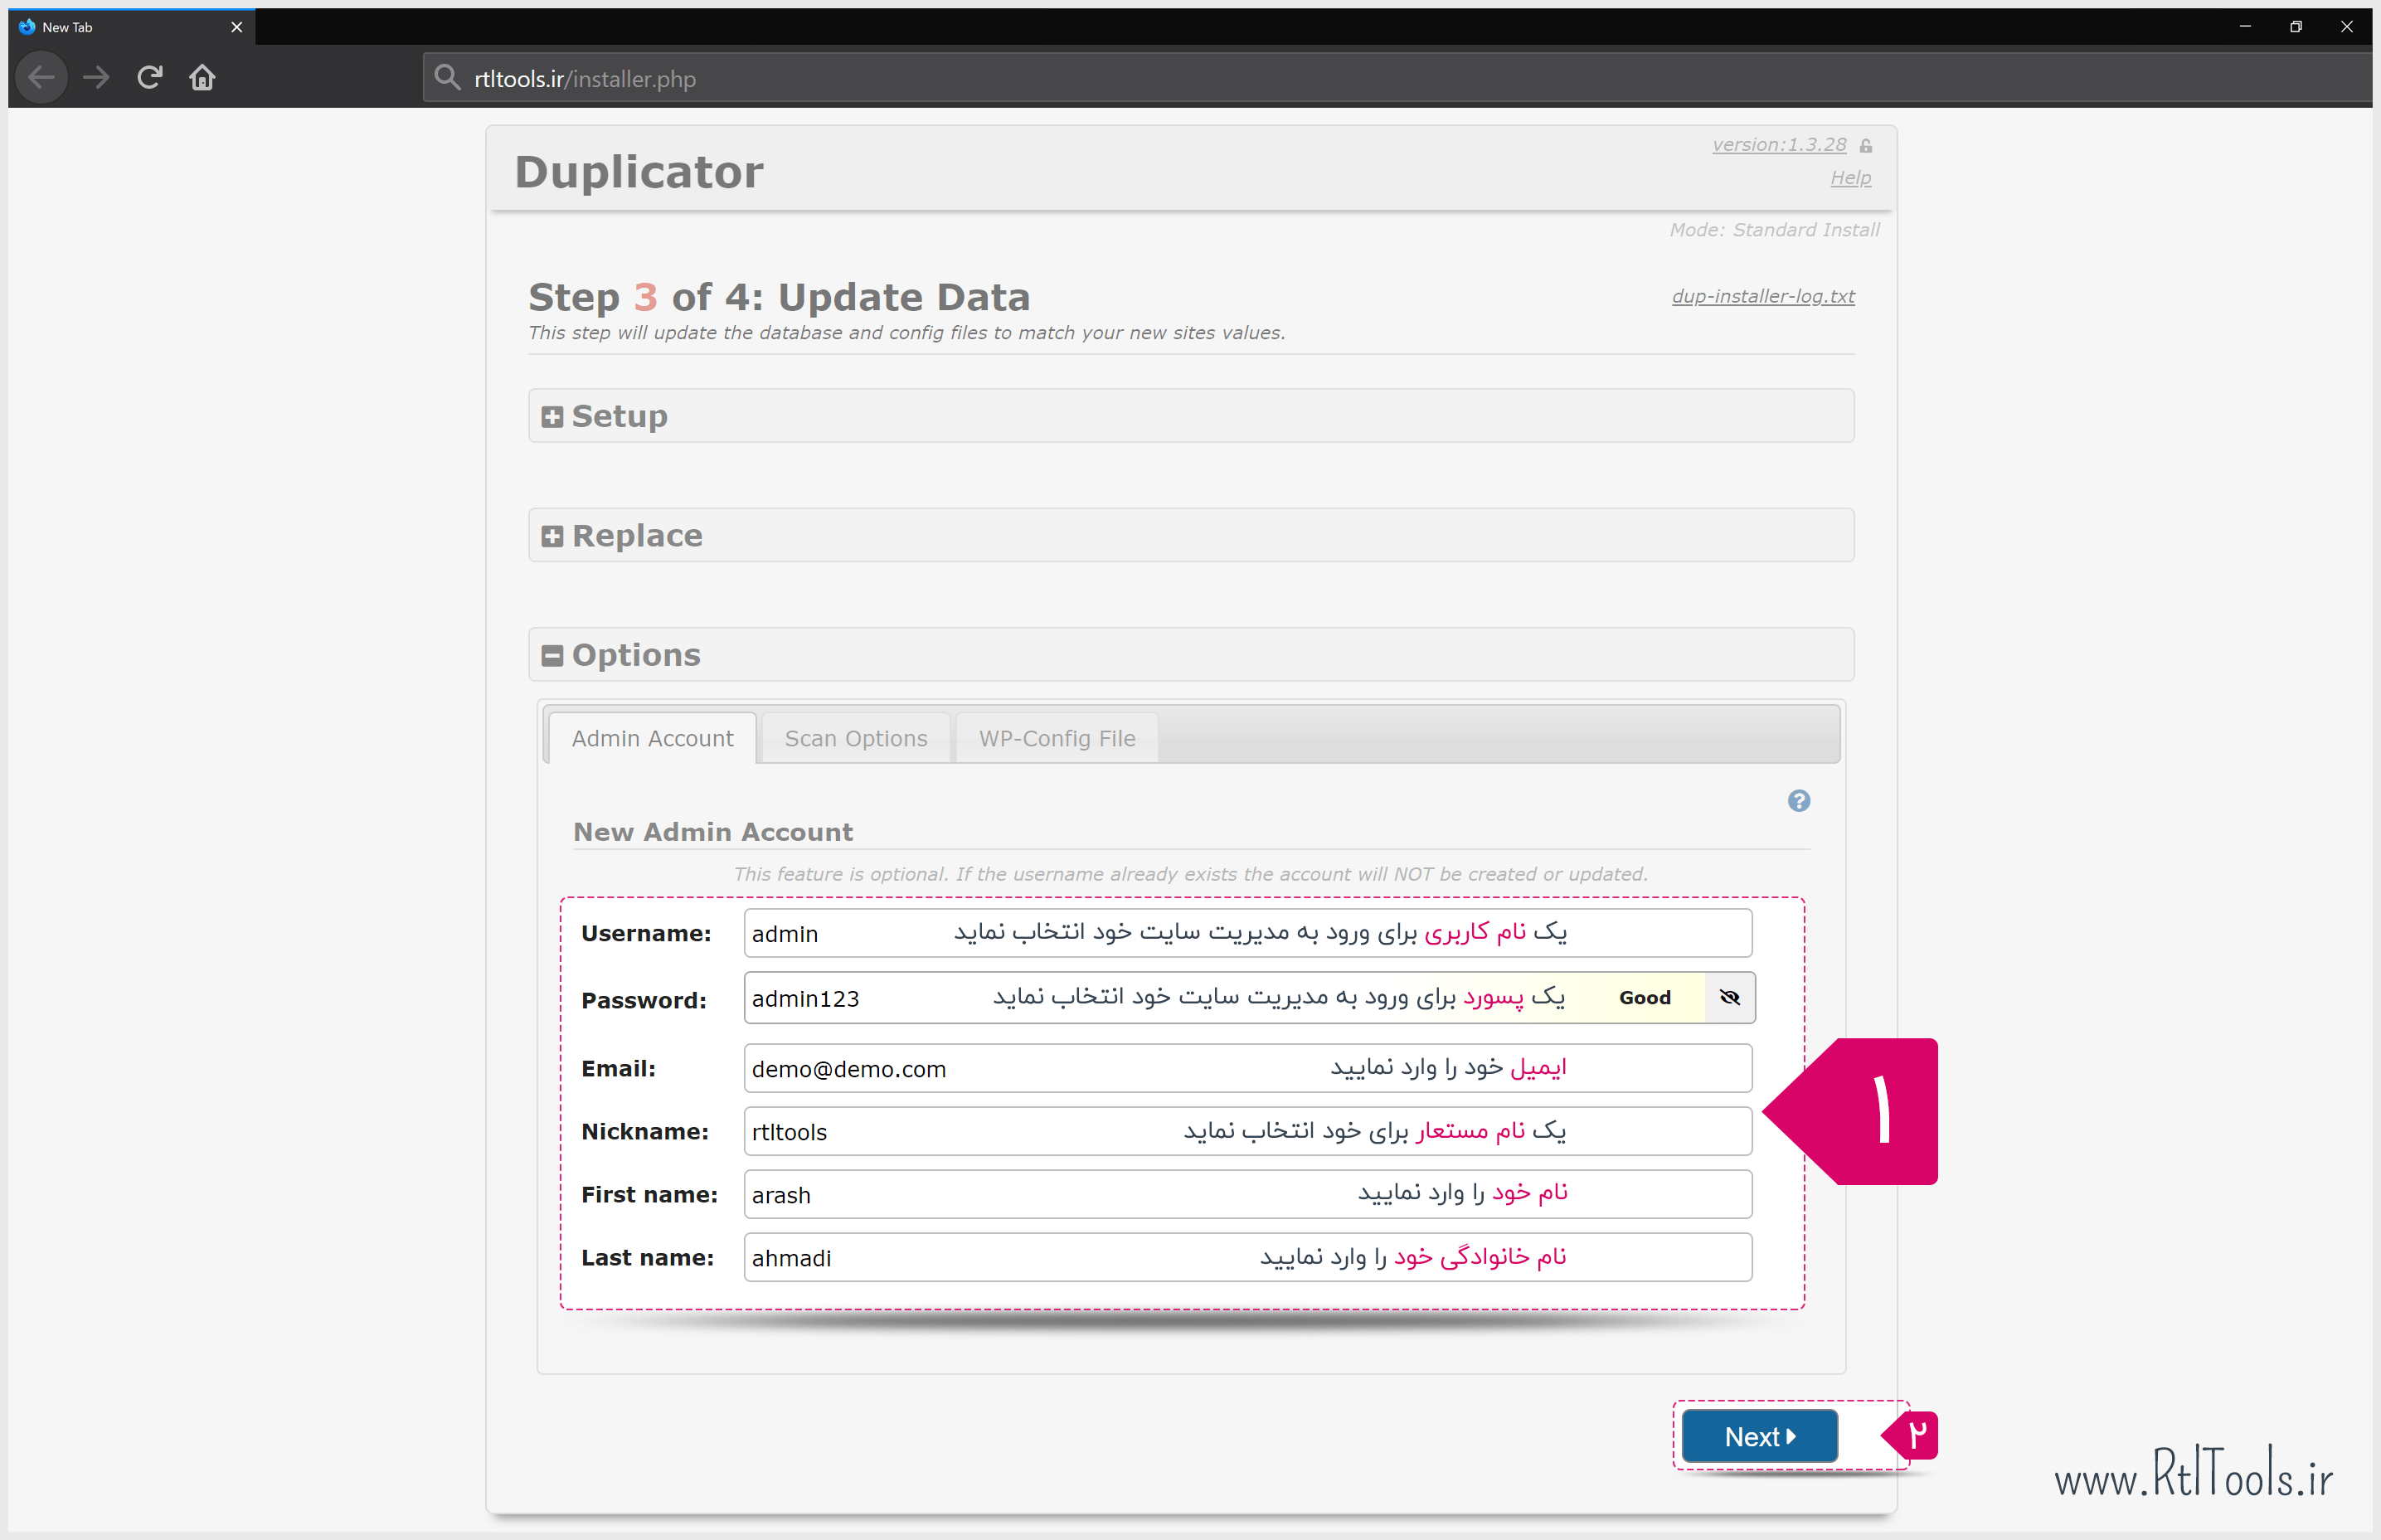 Step 3 Update Data | مراحل نصب قالب وردپرس Duplicator | آموزش تصویری راه اندازی بسته نصبی وردپرس